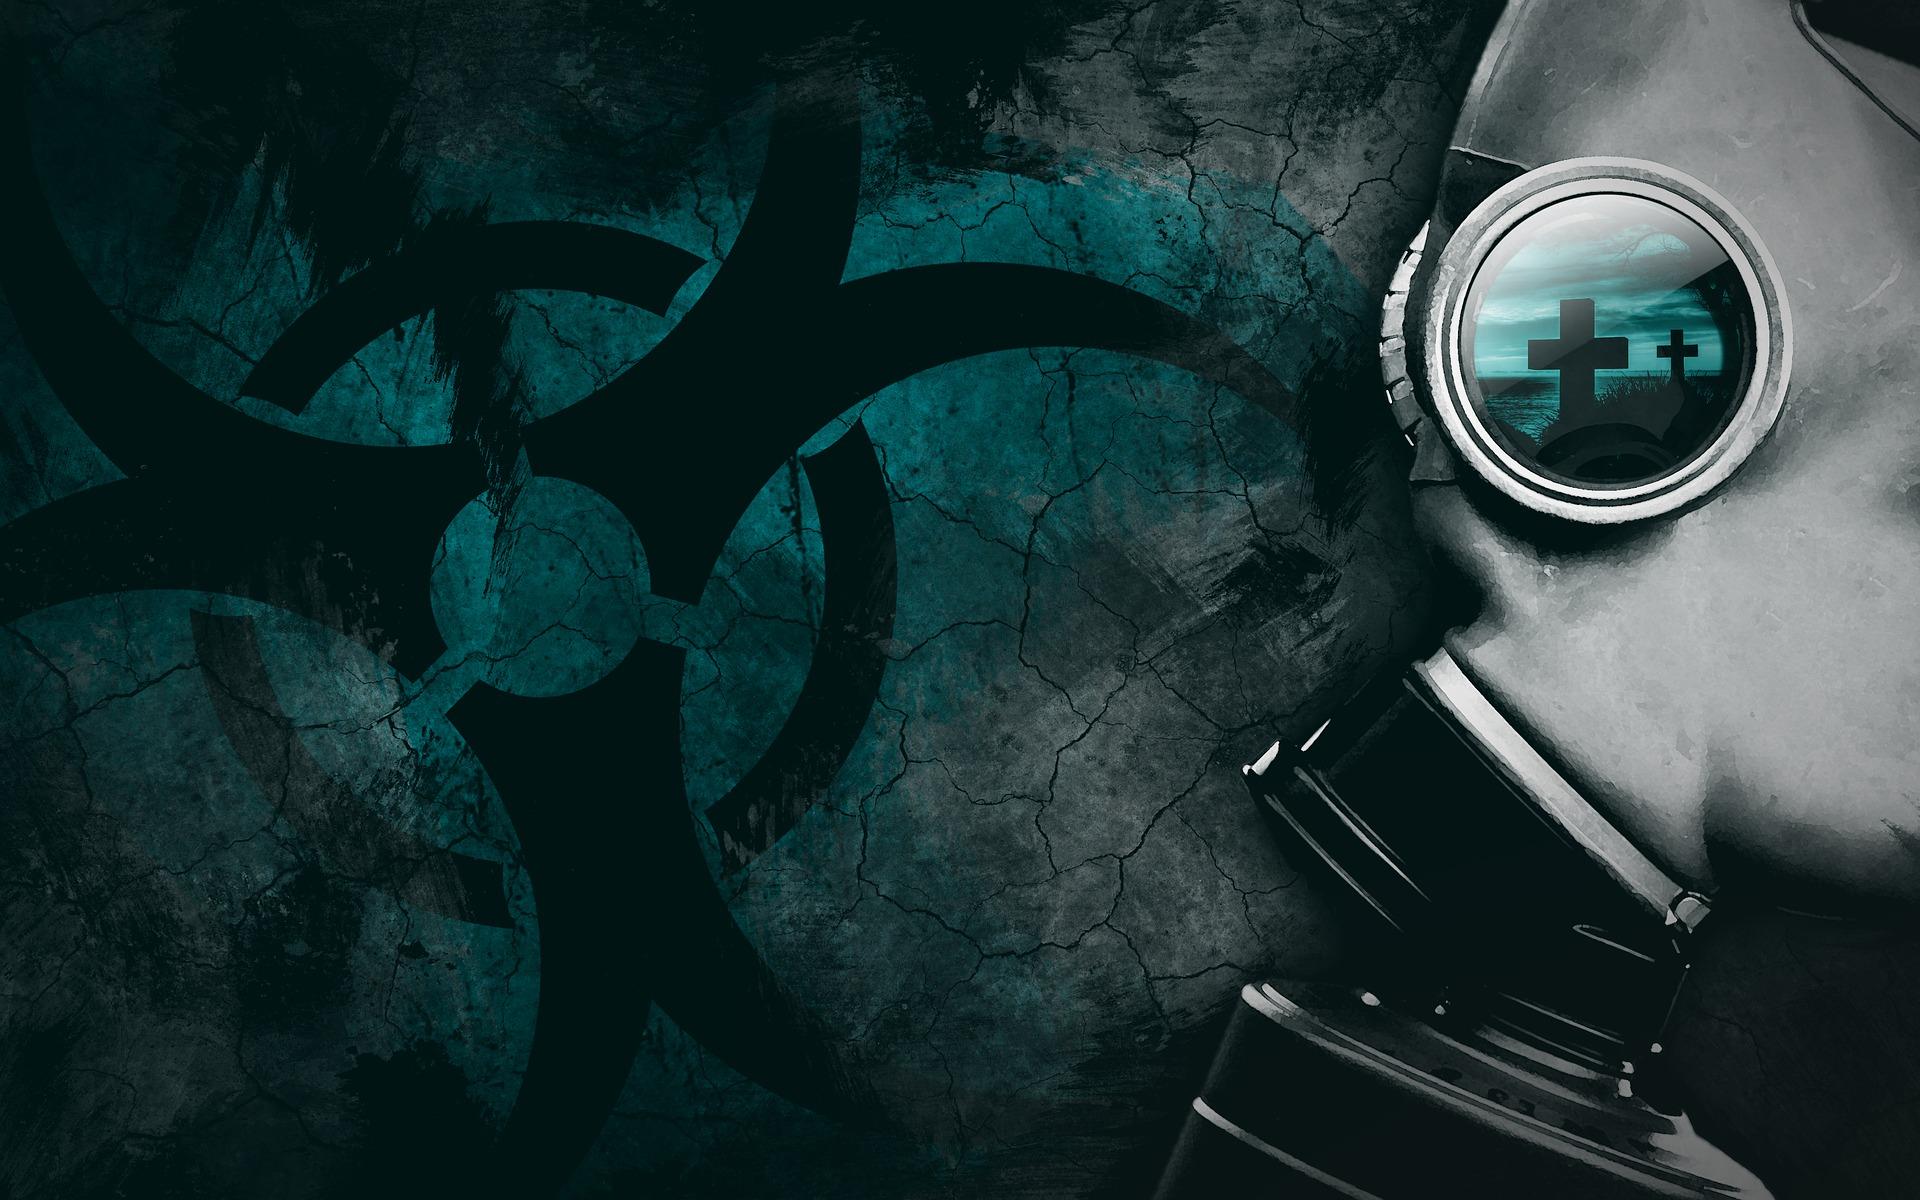 gas-mask-1714092_1920.jpg